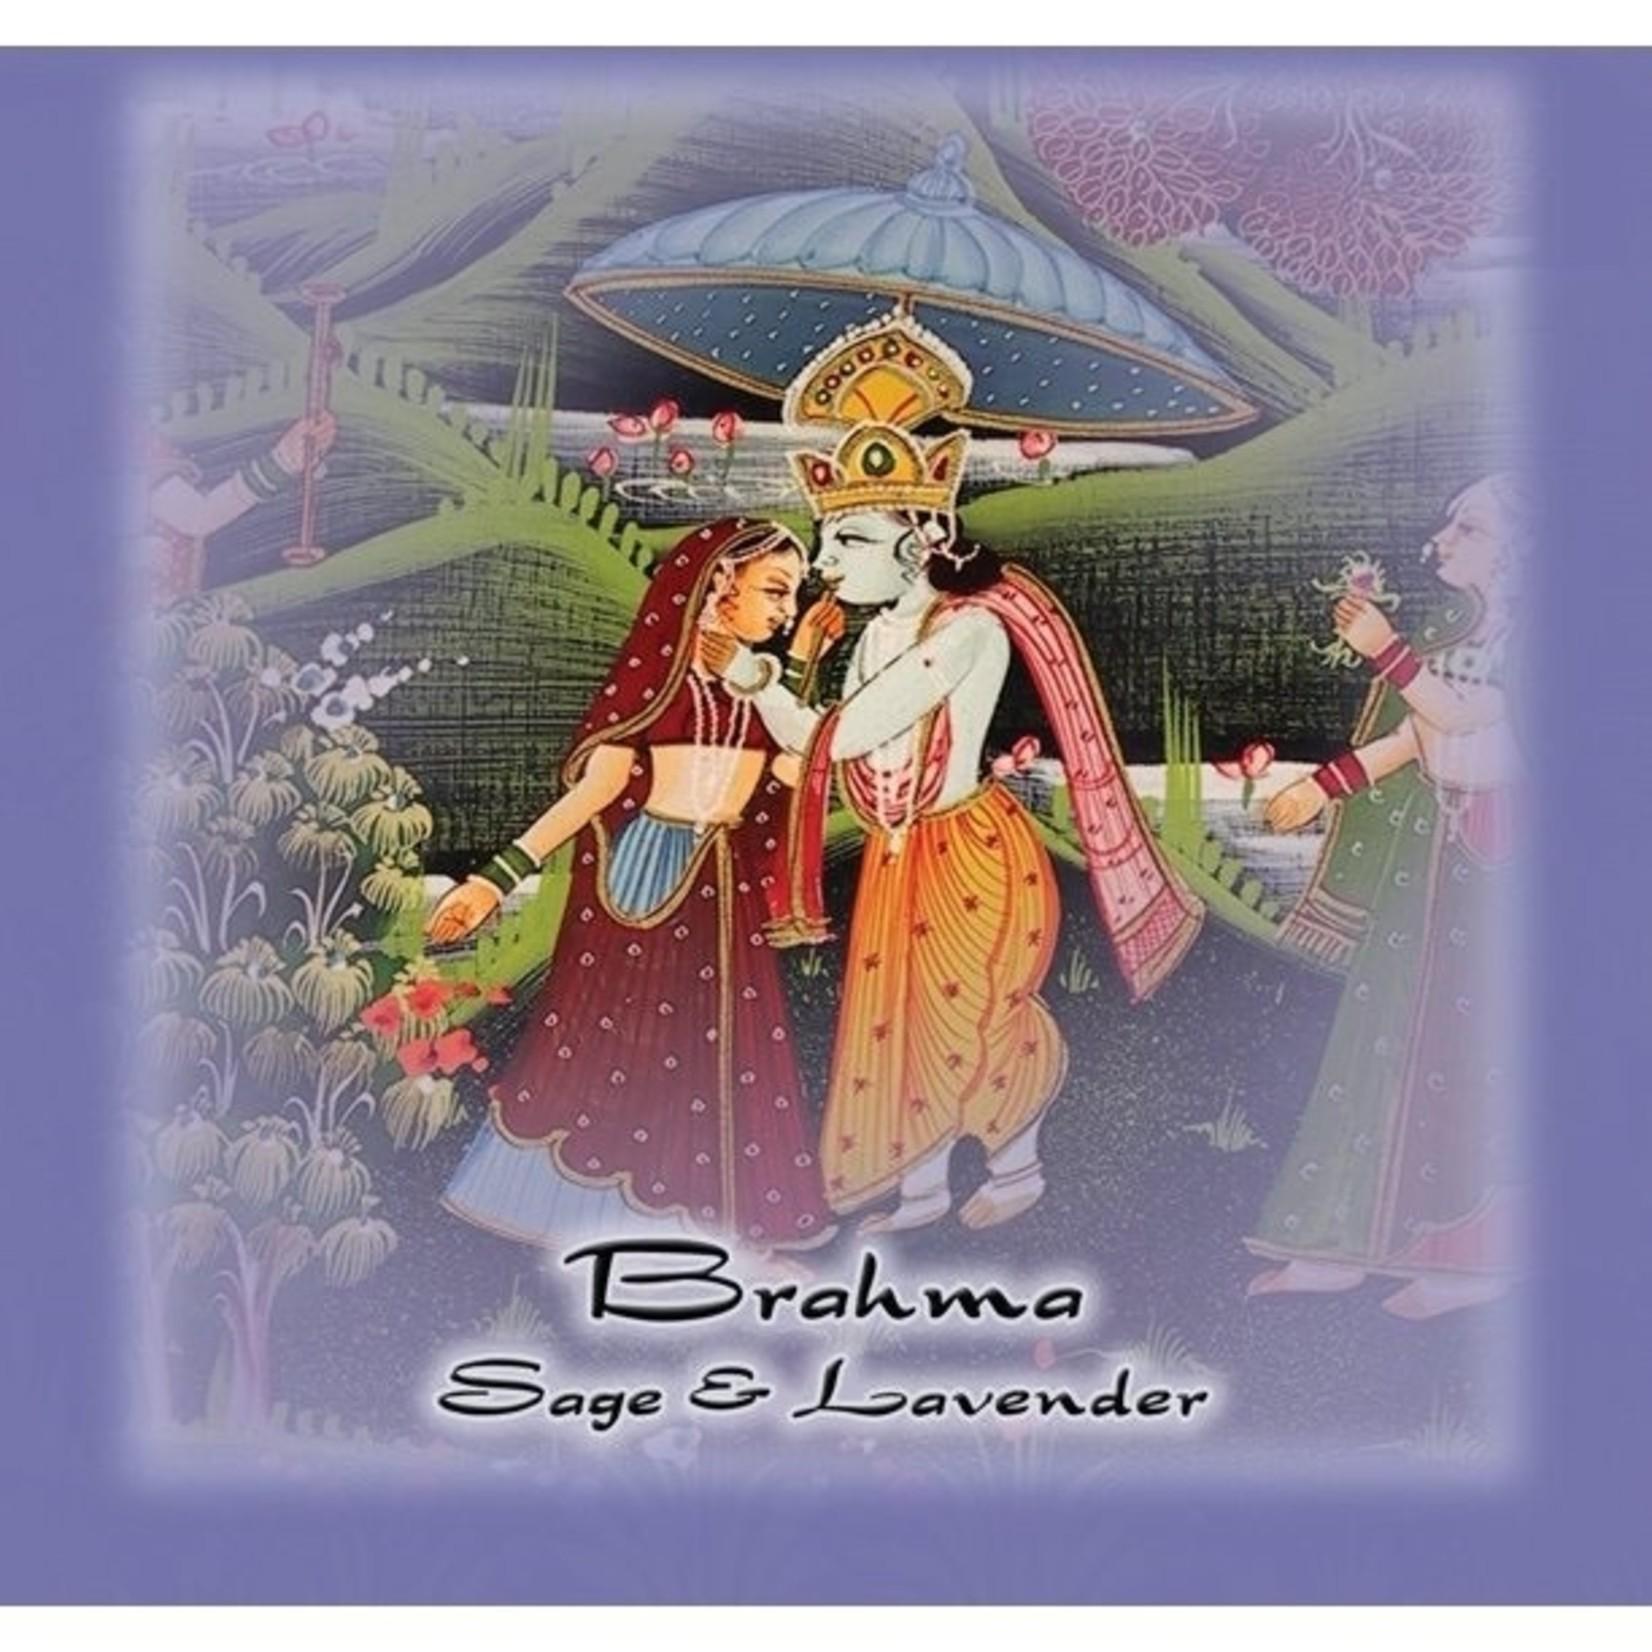 Prabhujis Gifts Desert Sage and Lavender Stick - Brahma Bundle